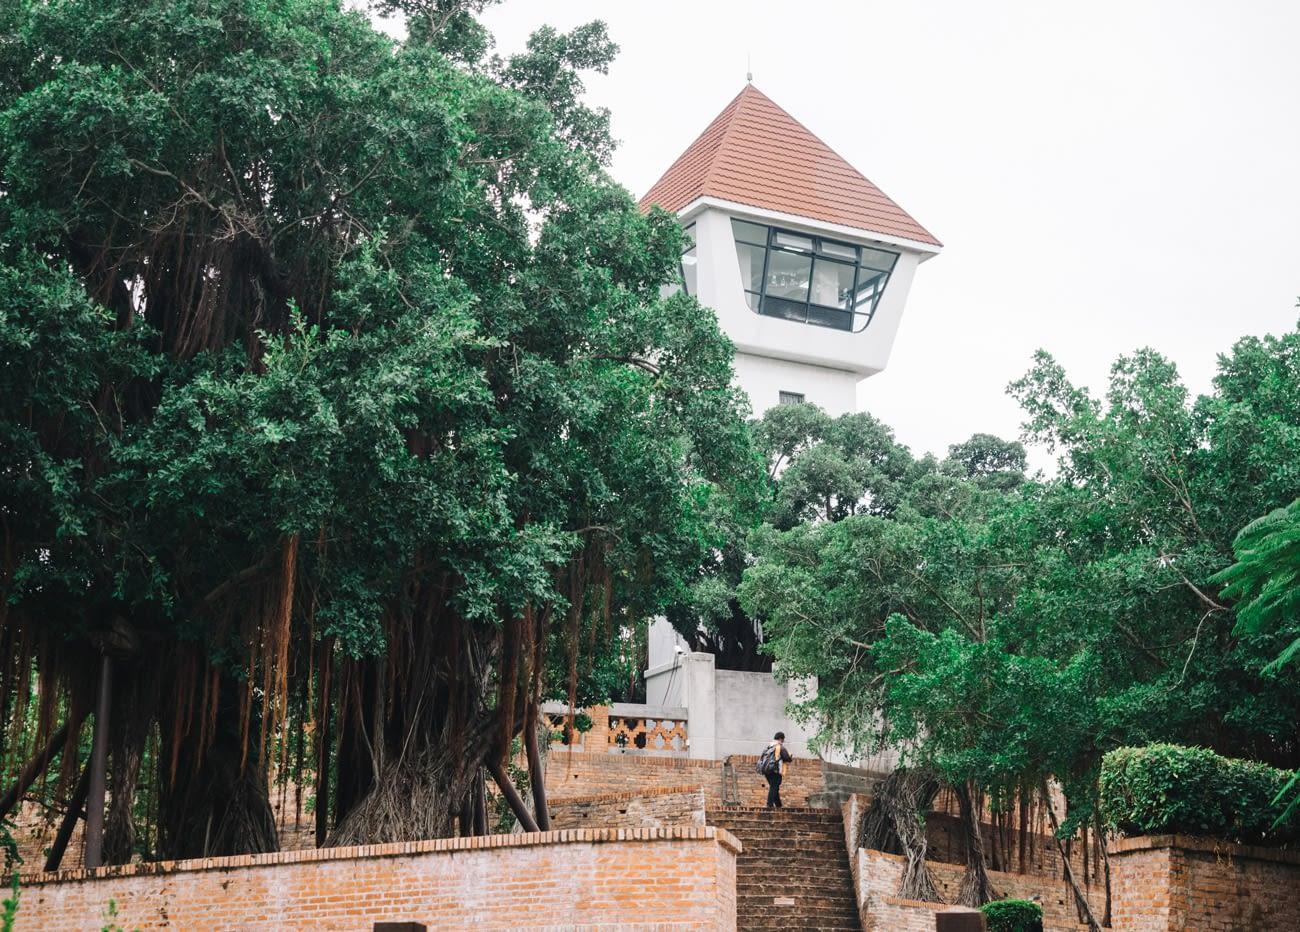 Tainan, Anping Old Fort 安平古堡